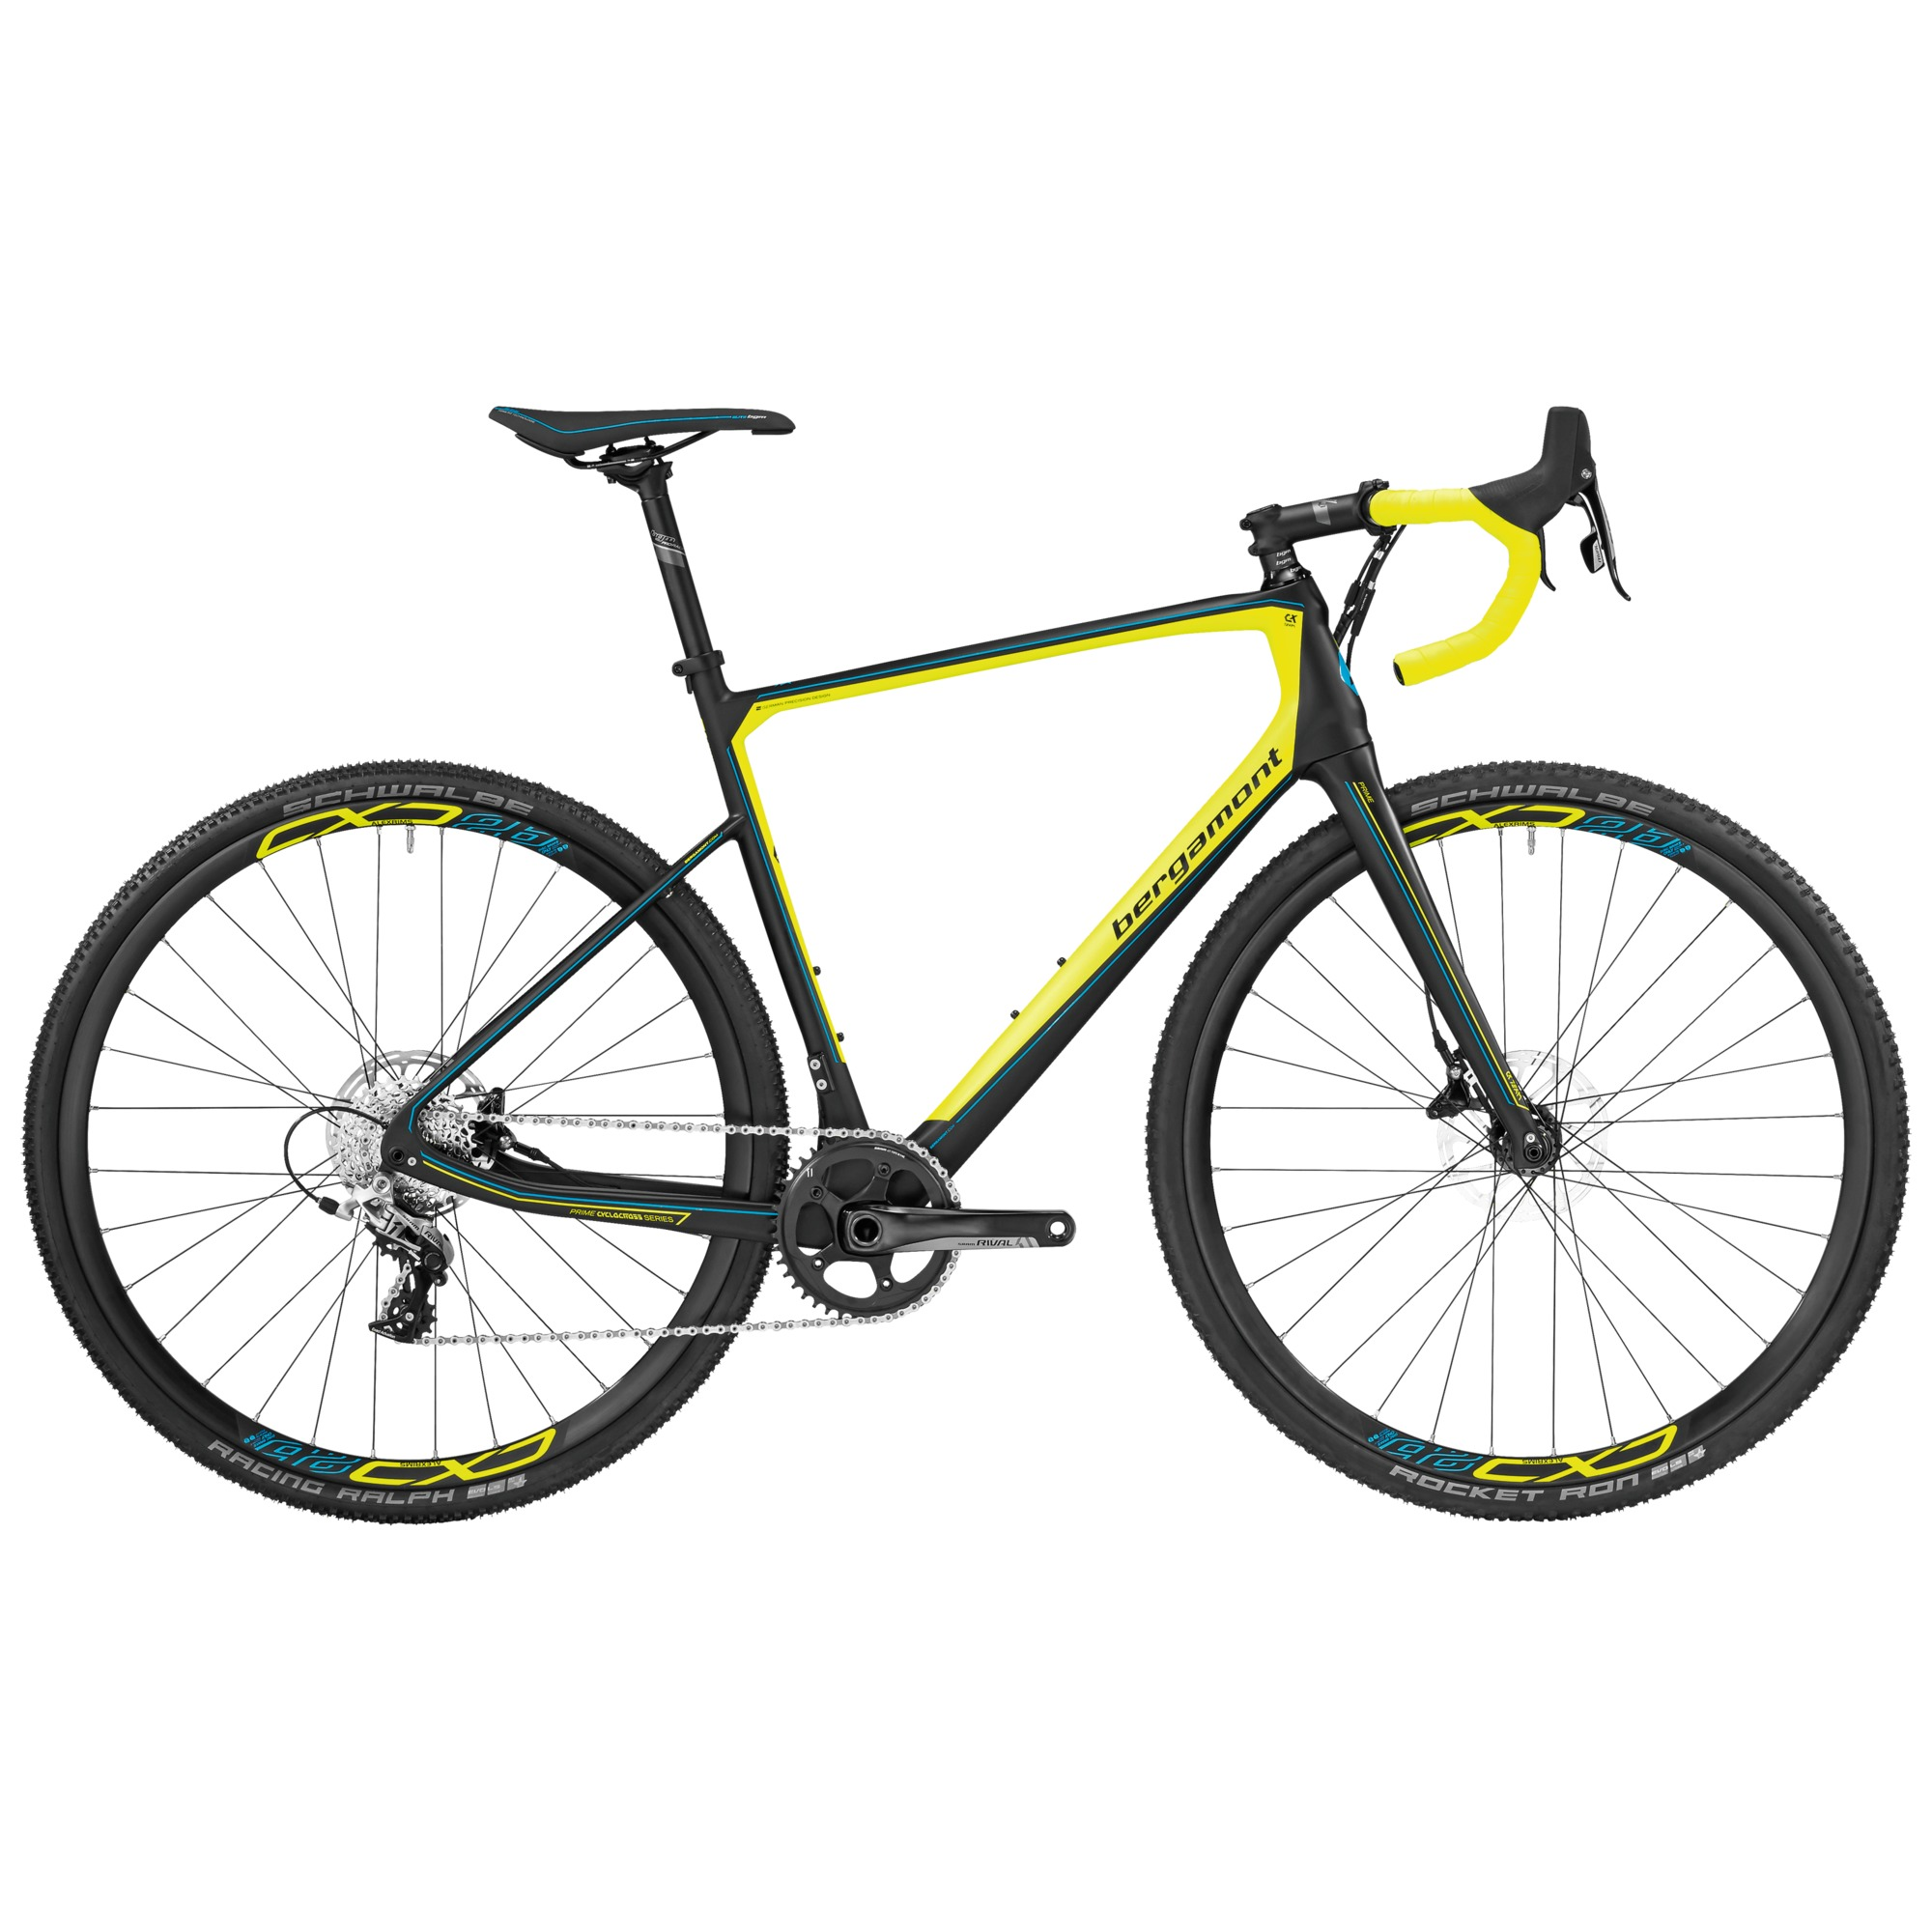 bergamont prime cx team 2017 cyclo cross gravel bike. Black Bedroom Furniture Sets. Home Design Ideas